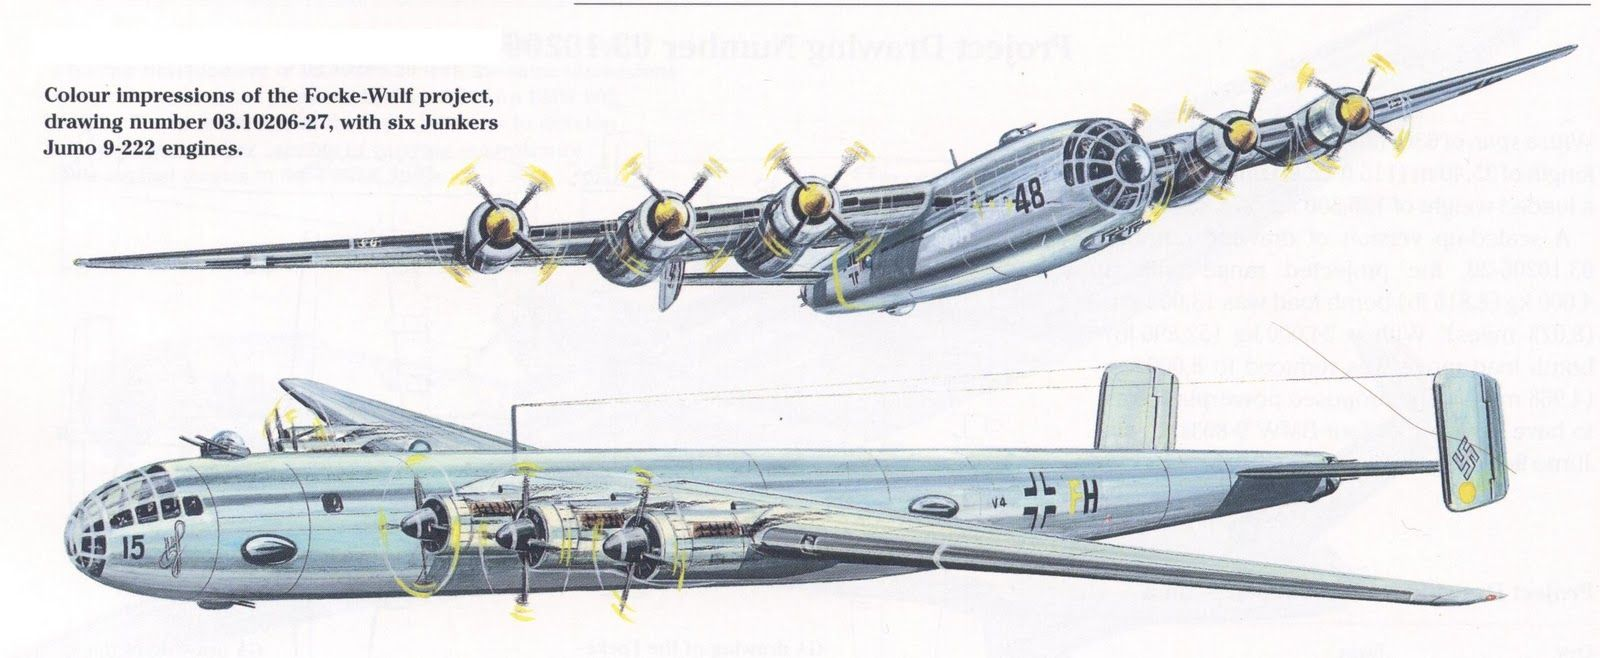 nazi secret weapons - Google Search | WW2 Aircraft ...